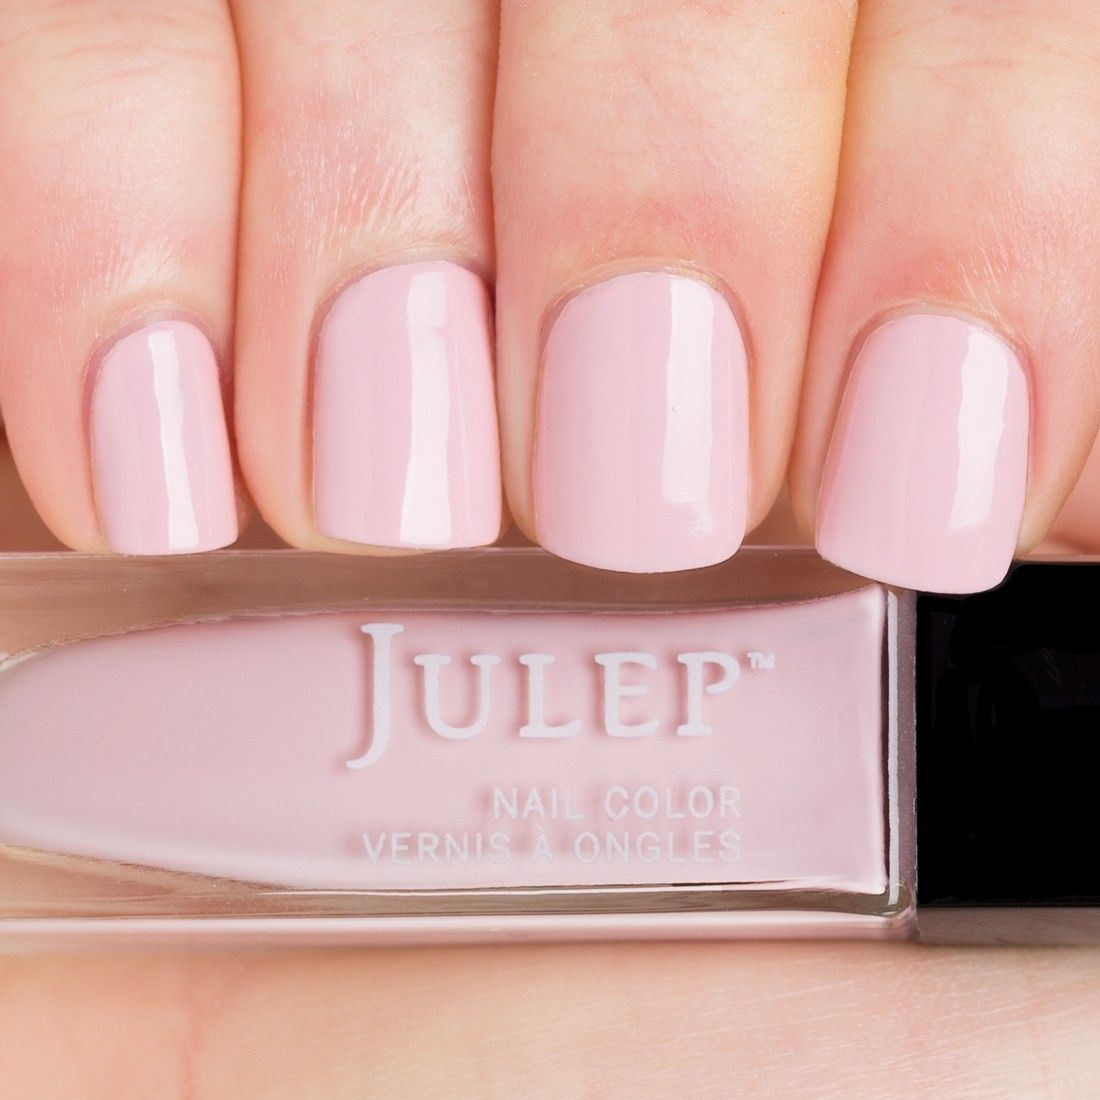 Carla - It Girl | Julep | My Nail Colors | Pinterest | Makeup, Girls ...